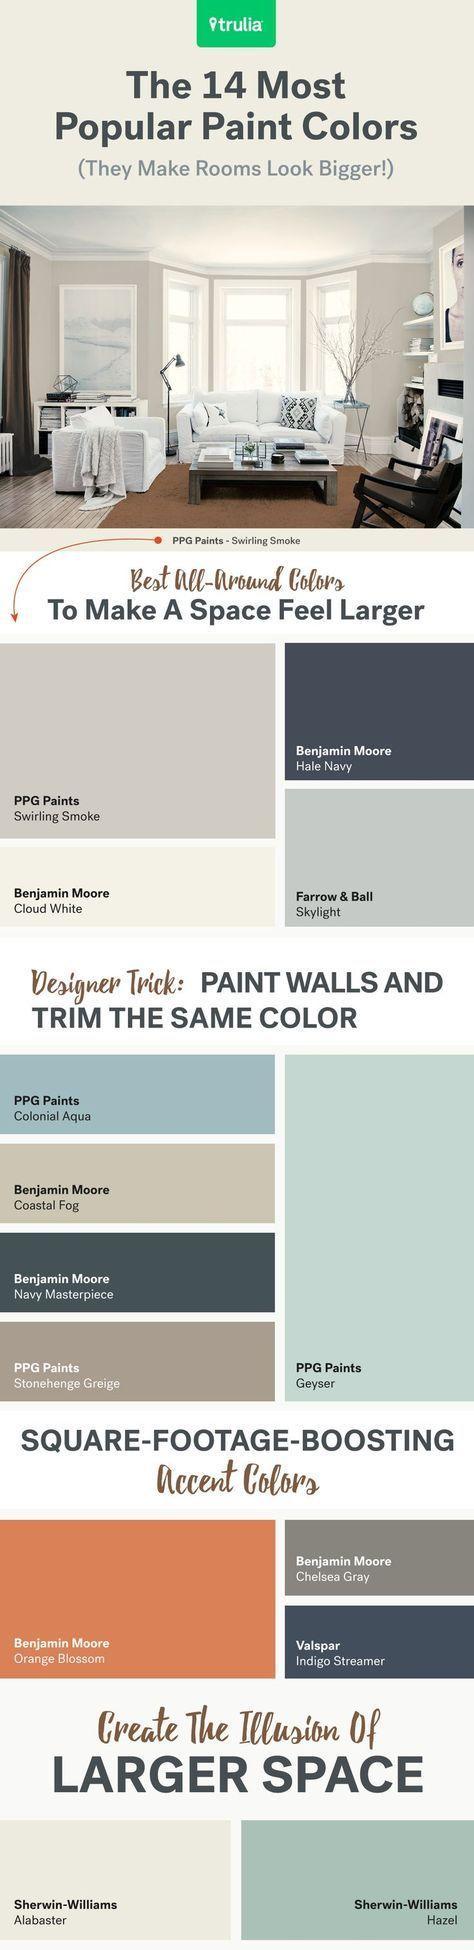 98f3d57d6b4e5f5666f0687591cce792 paint sprayer walls paint. Black Bedroom Furniture Sets. Home Design Ideas